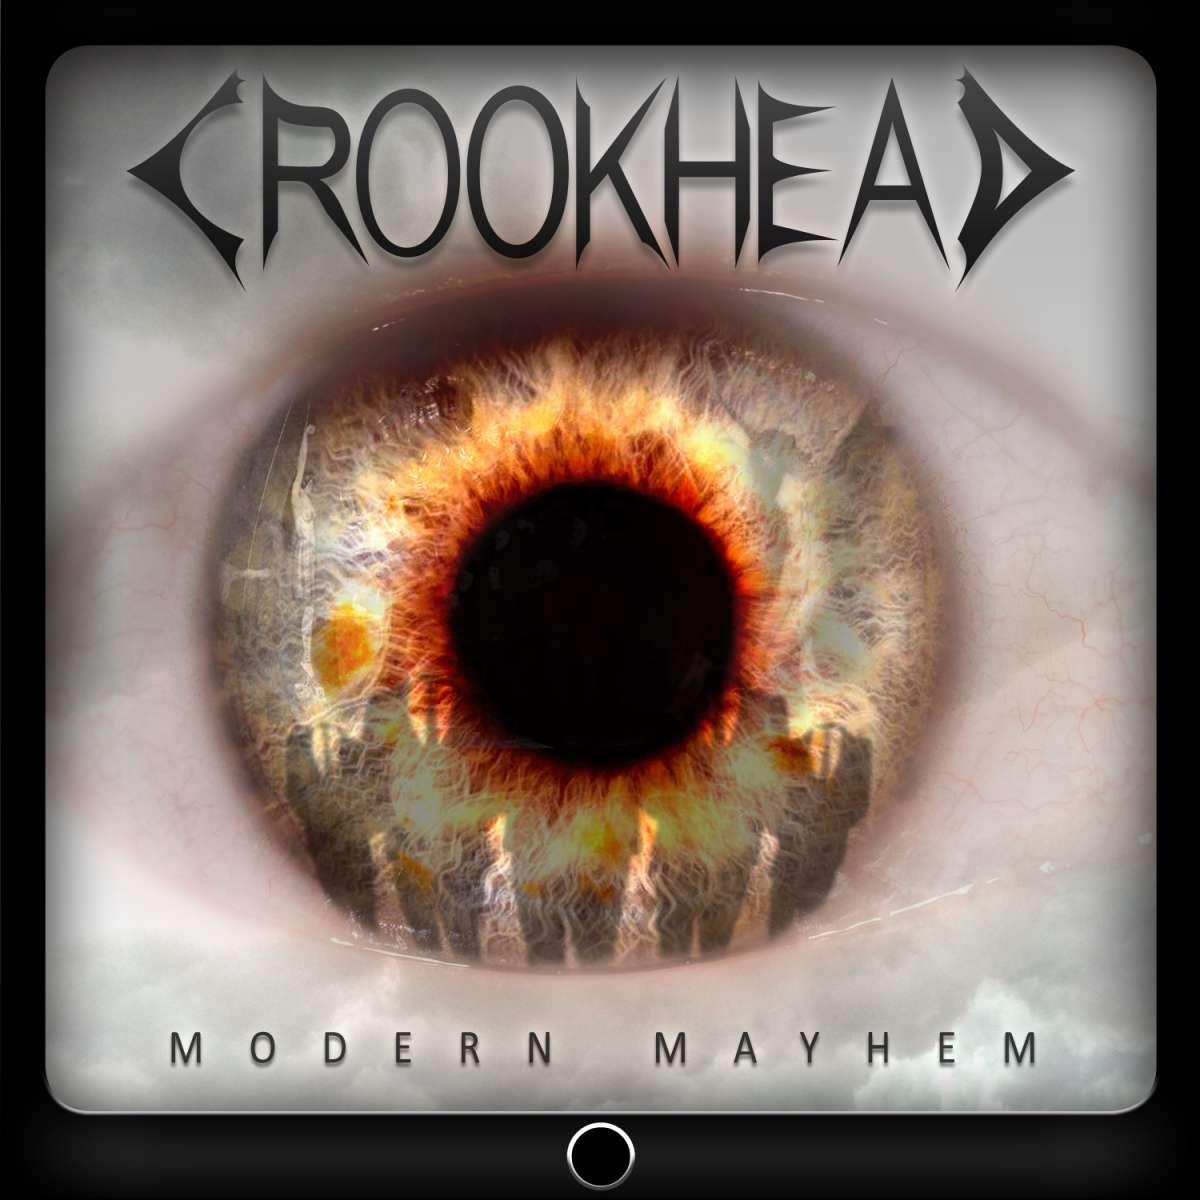 Crookhead – Modern Mayhem